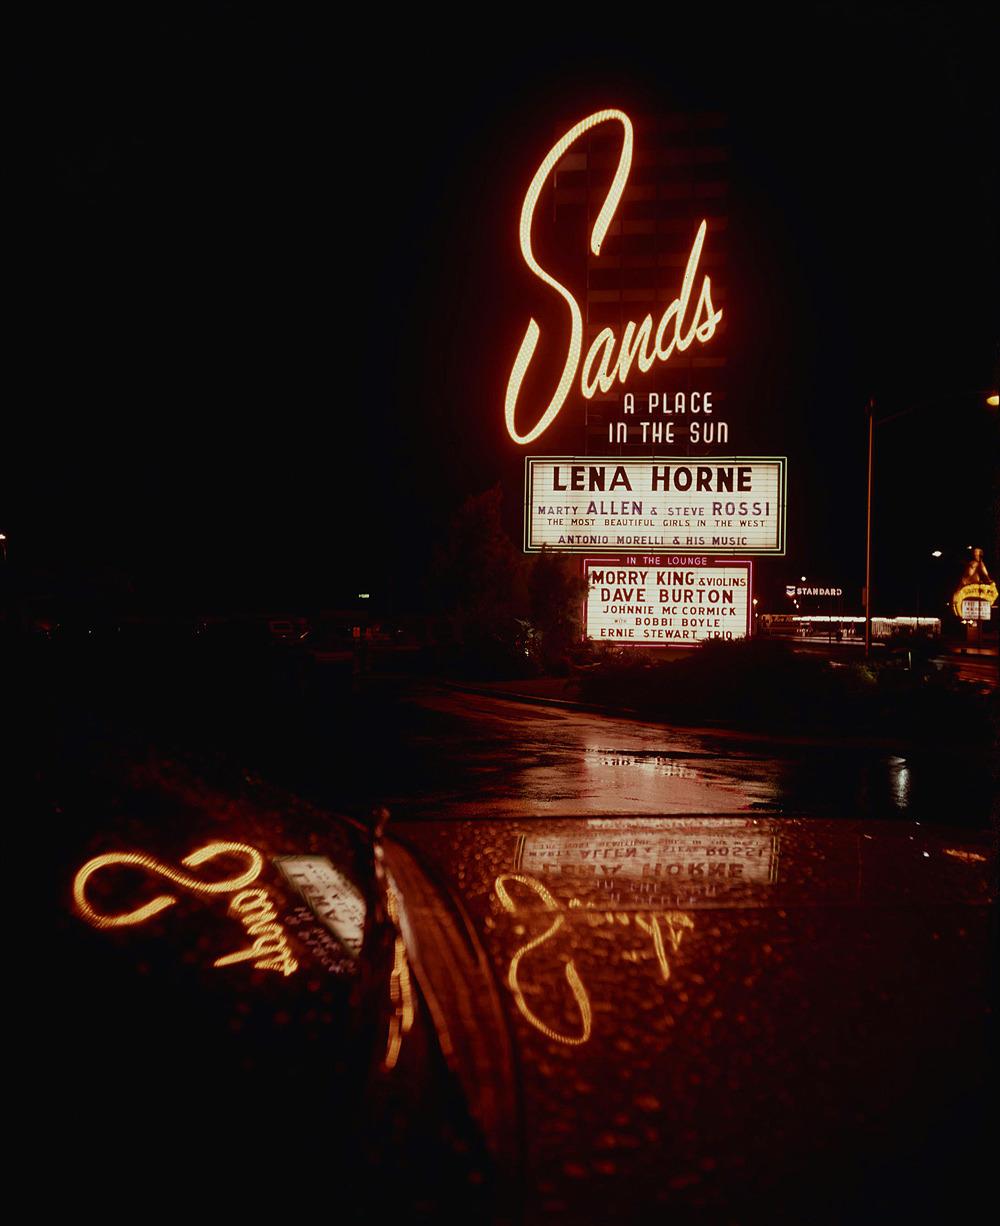 Sands Hotel and Casino - Las Vegas, Nevada U.S.A. - November 1961